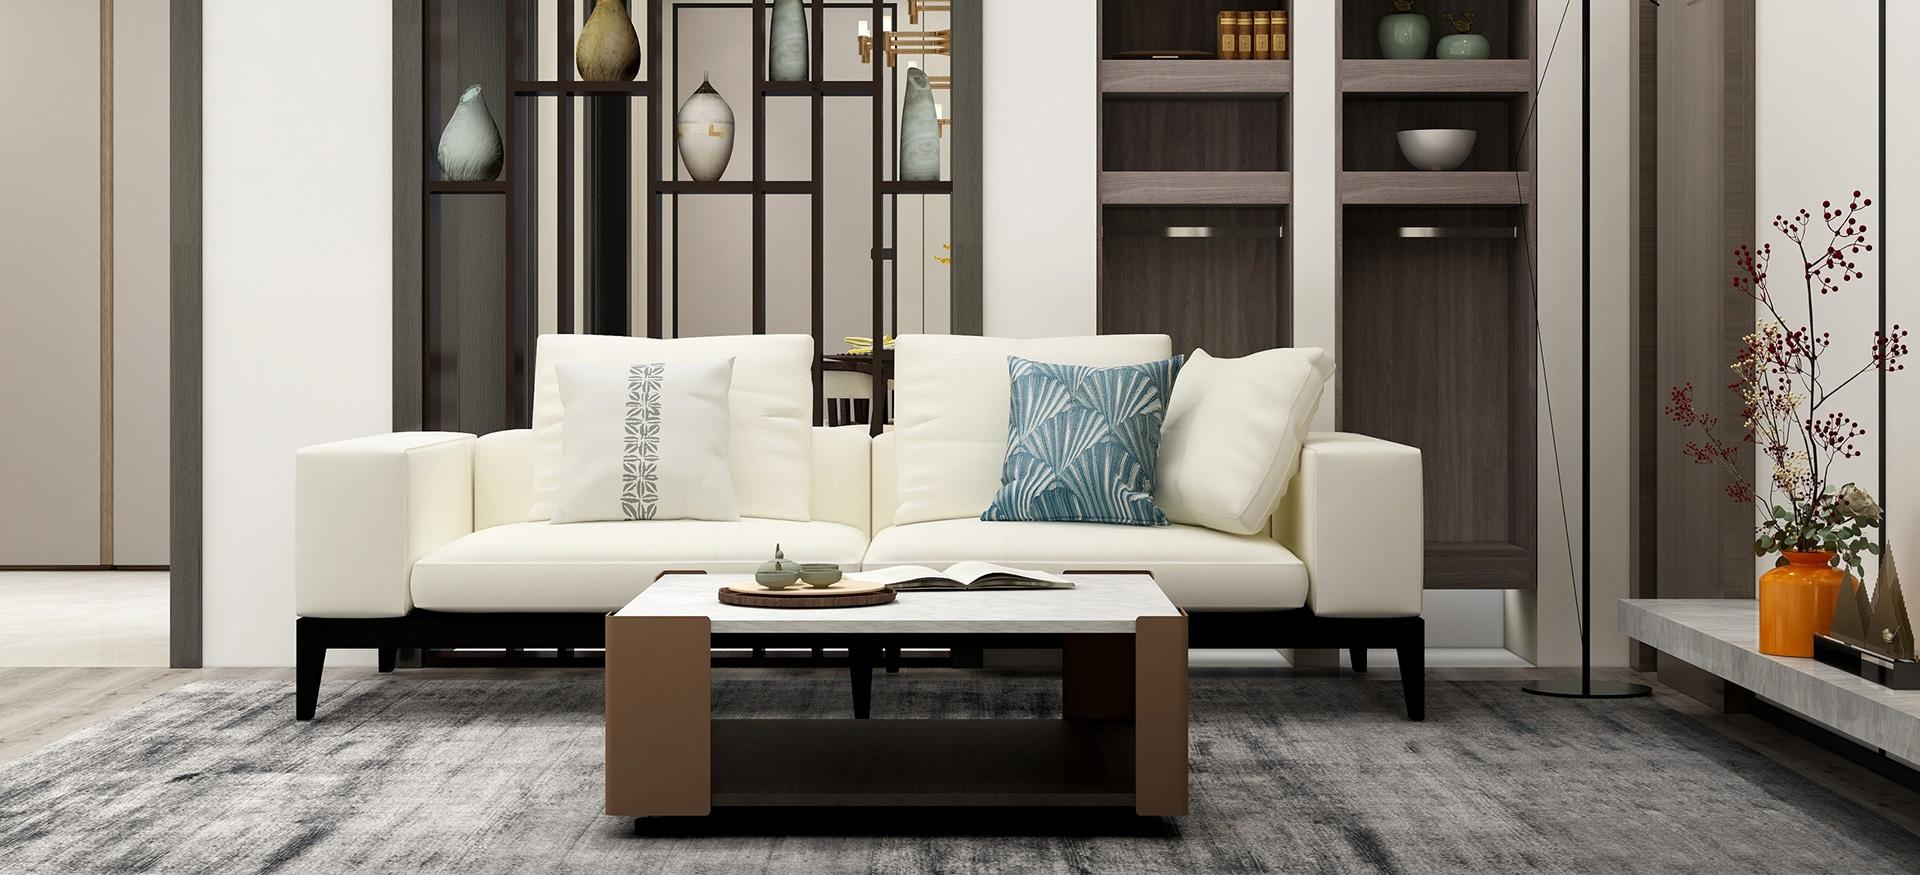 Moodie Sofa